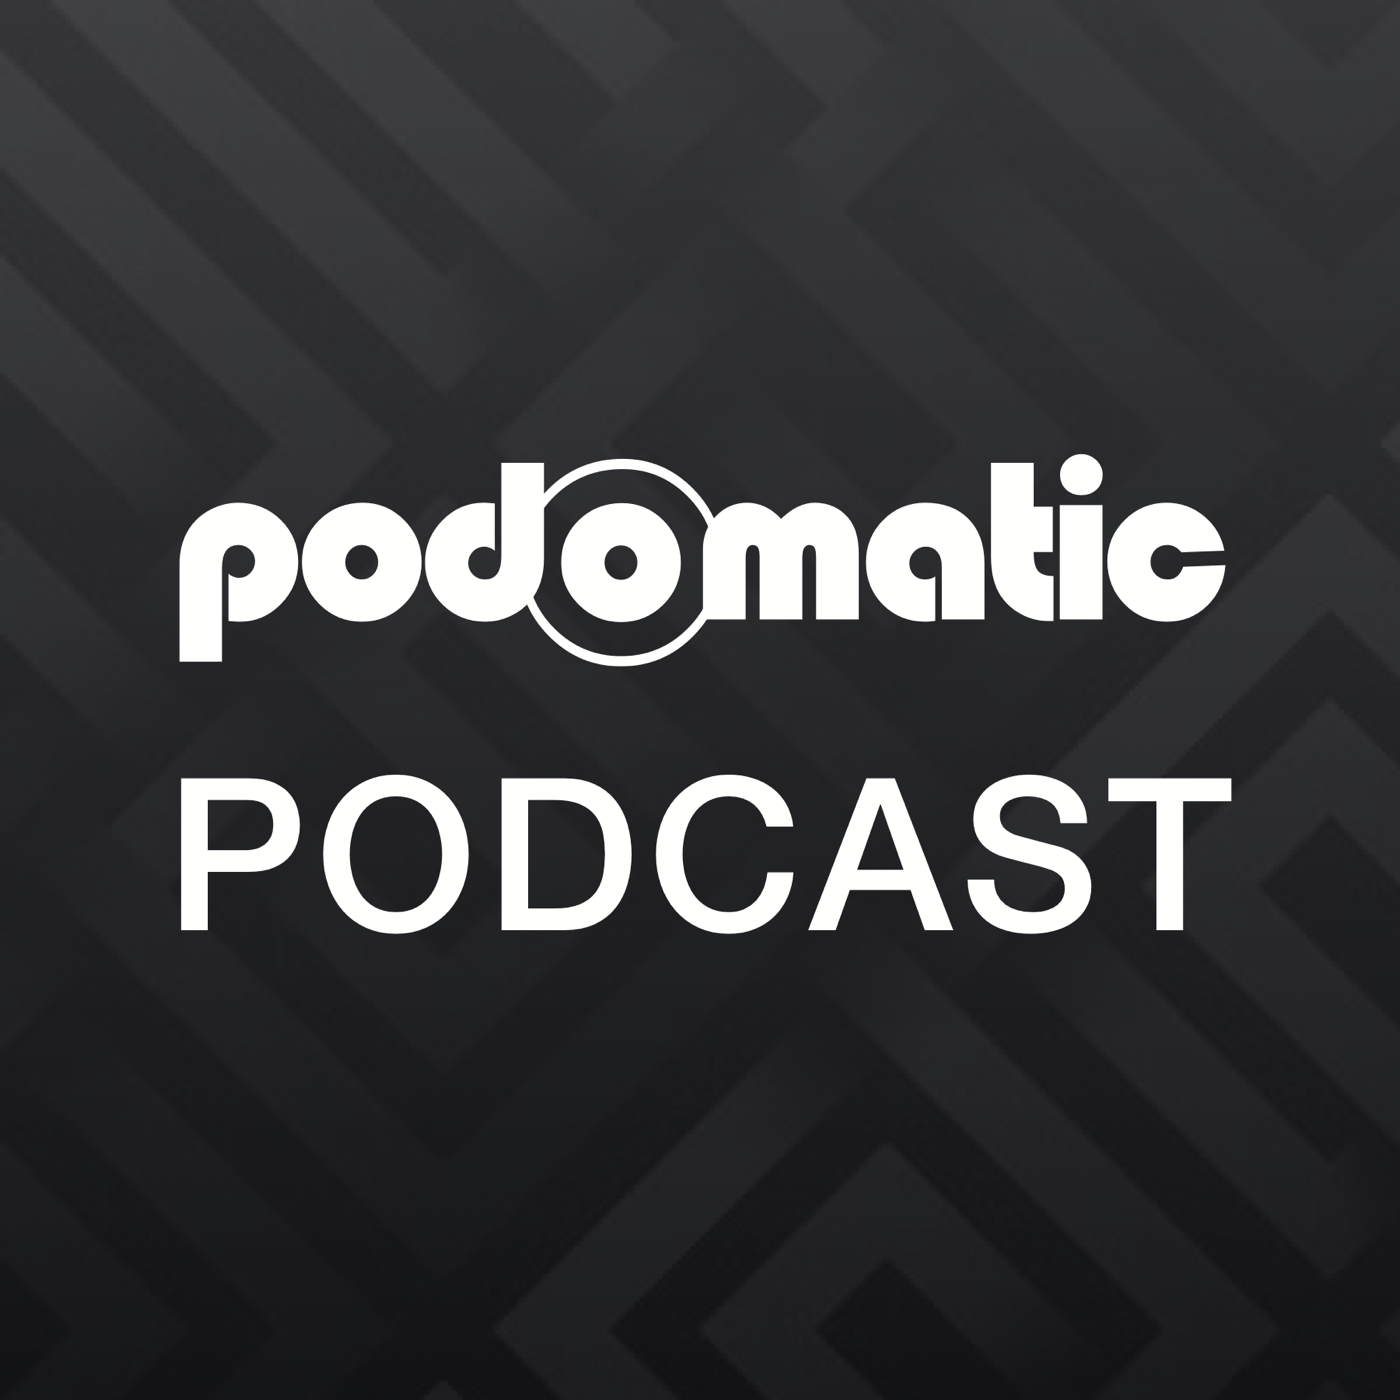 Thiago COnde's Podcast